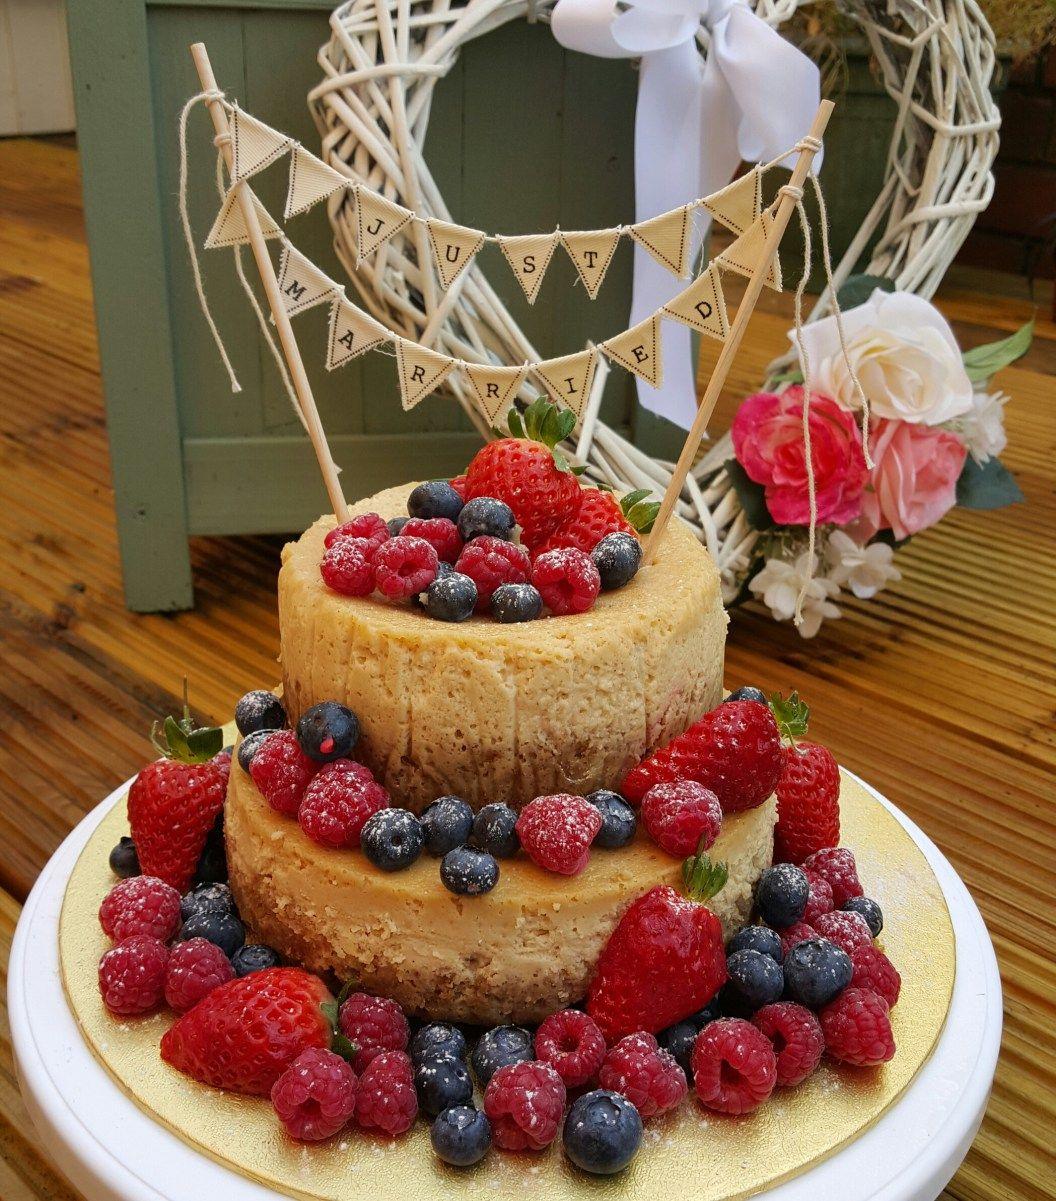 Tiered Wedding Cheesecake Alternative Cake Ideas Www Lefkasweddings